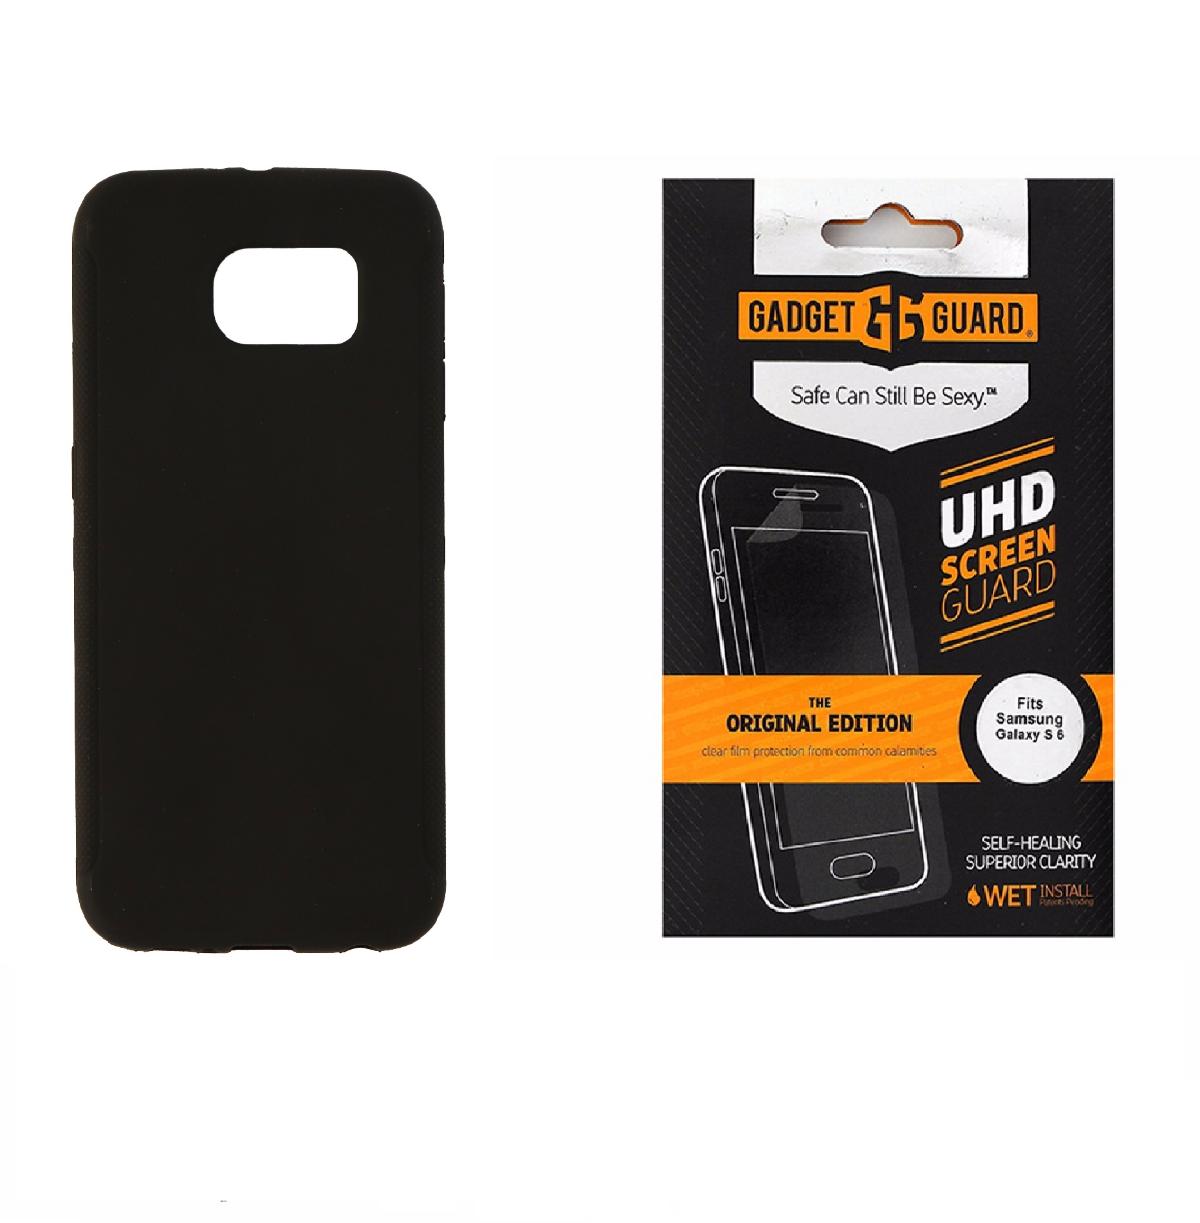 Insignia Black Case + Gadget Guard Screen Protector for Samsung Galaxy S6